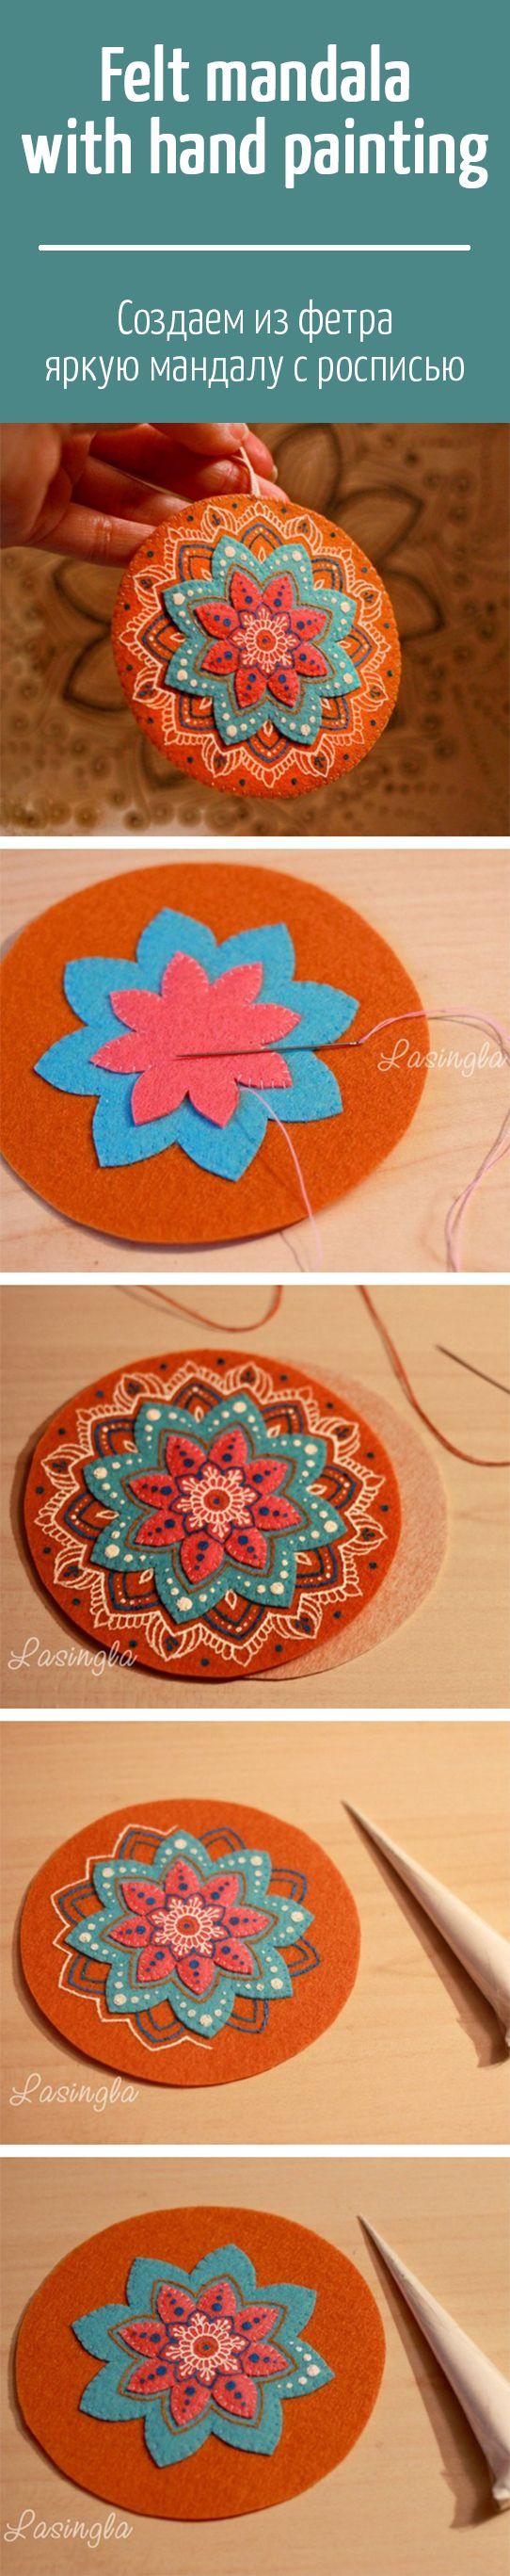 Felt mandala with hand painting: pattern and tutorial / Создаем яркую мандалу из фетра: по ссылке есть шаблоны